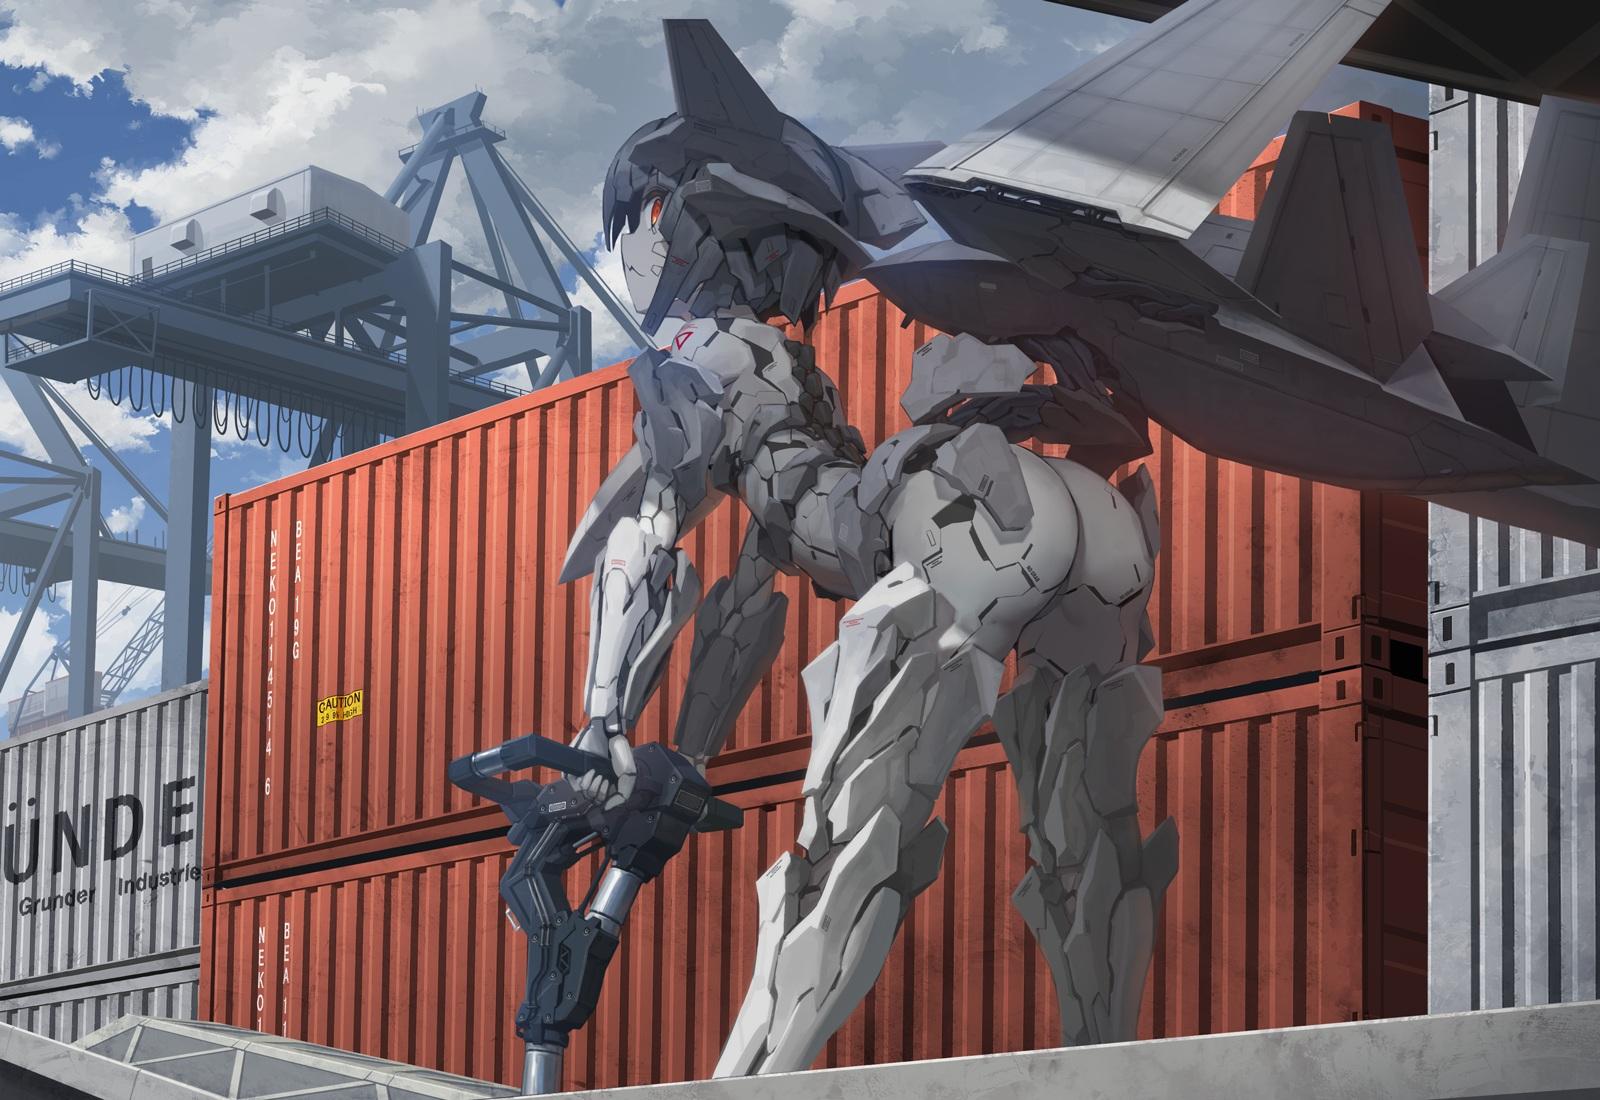 ace combat ace combat 7 anthropomorphism armor ass black